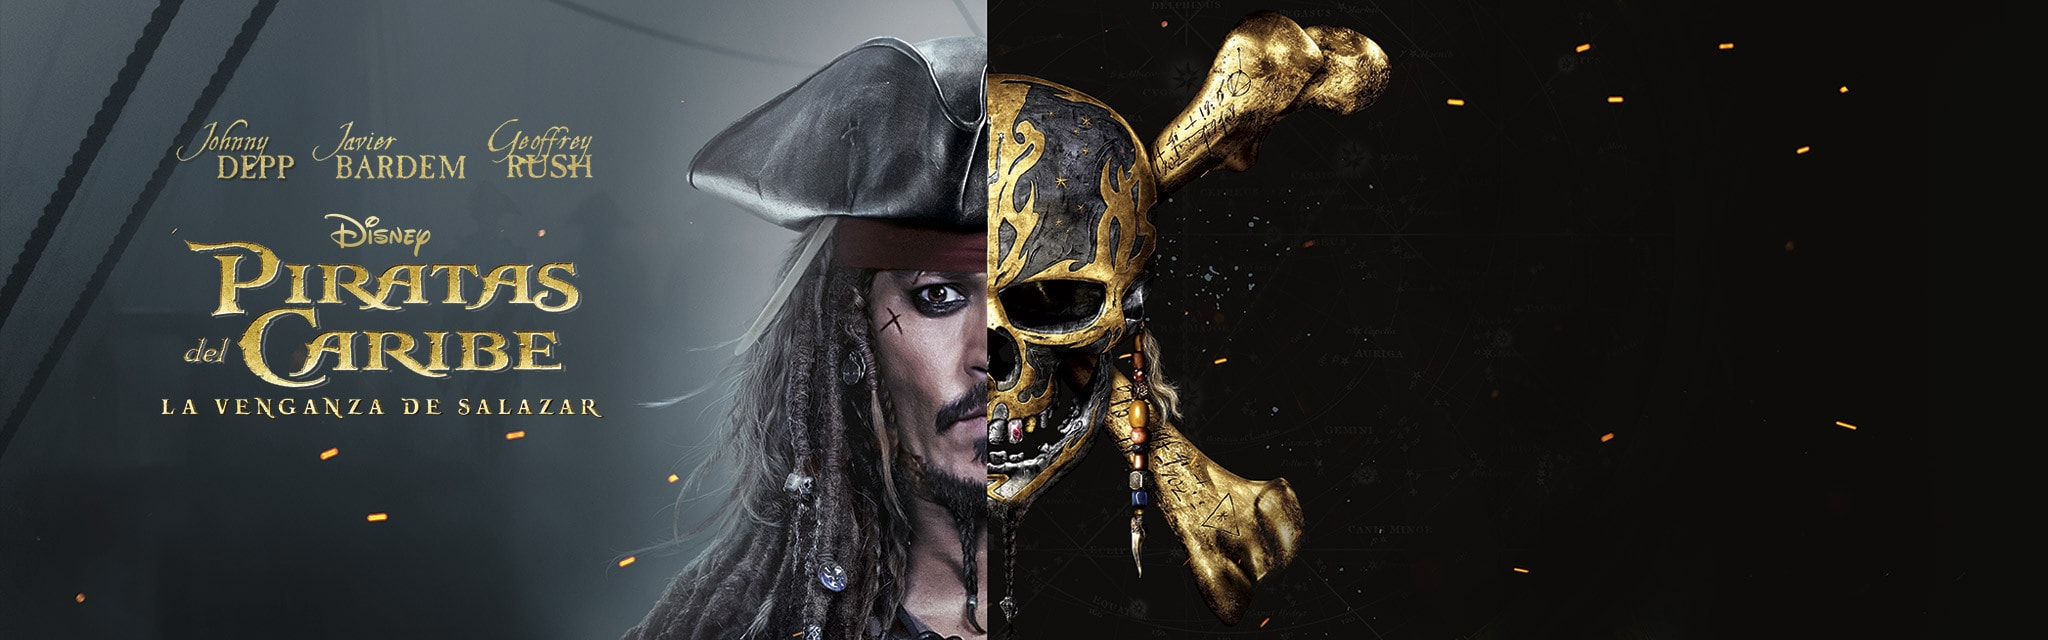 HL_Pirates of the Caribbean 5_Latam